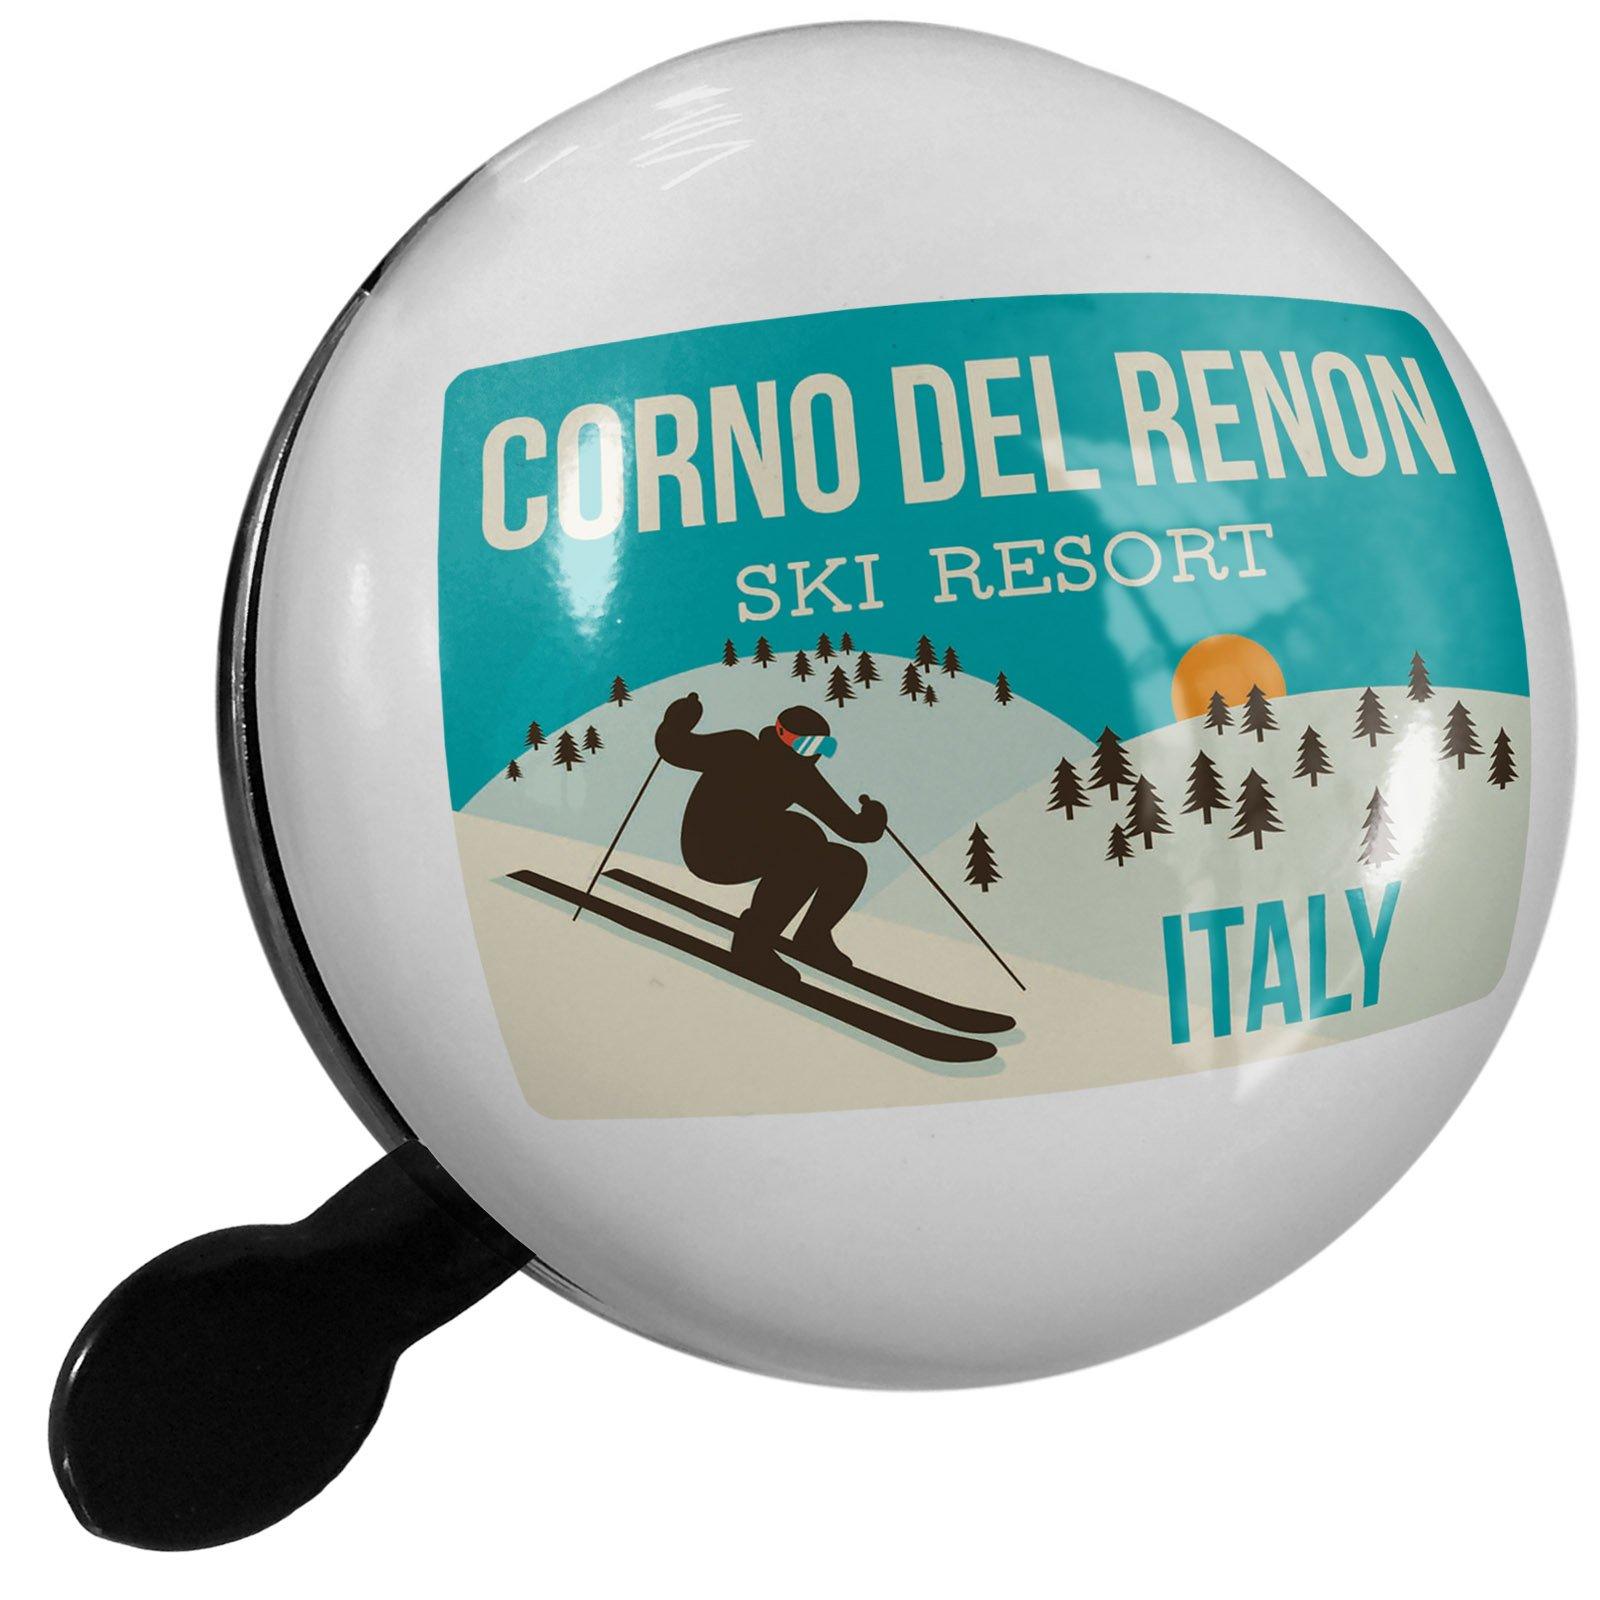 Small Bike Bell Corno del Renon Ski Resort - Italy Ski Resort - NEONBLOND